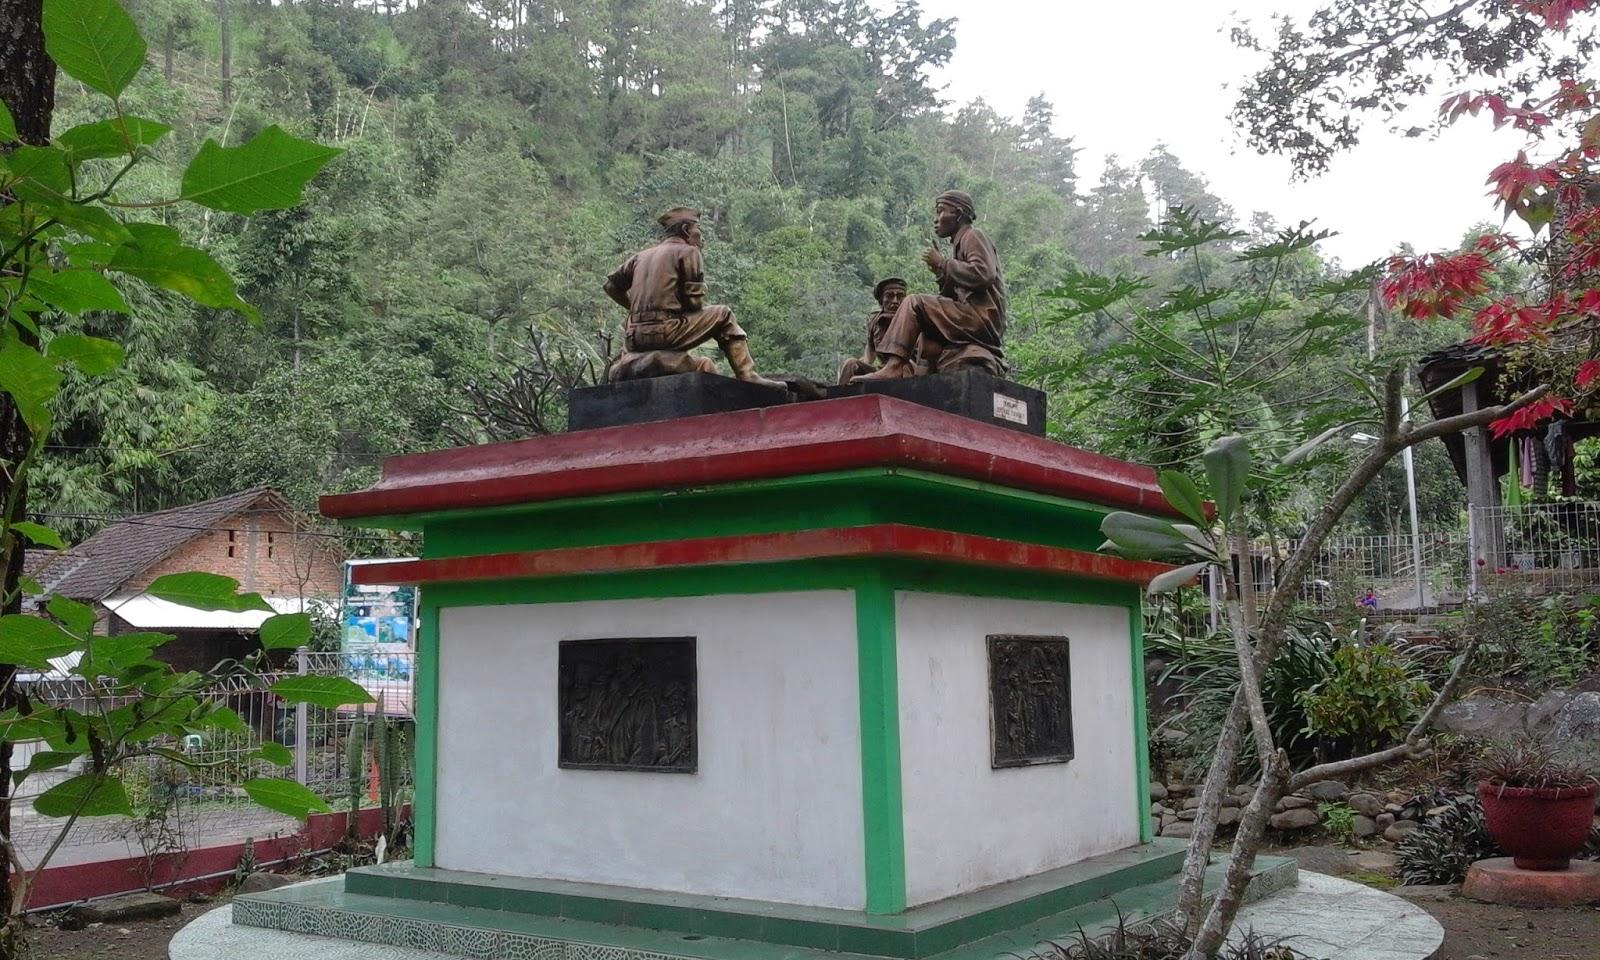 Petilasan Jendral Sudirman Kota Kabupaten Nganjuk Wisata Mungkin Bagi Pertama